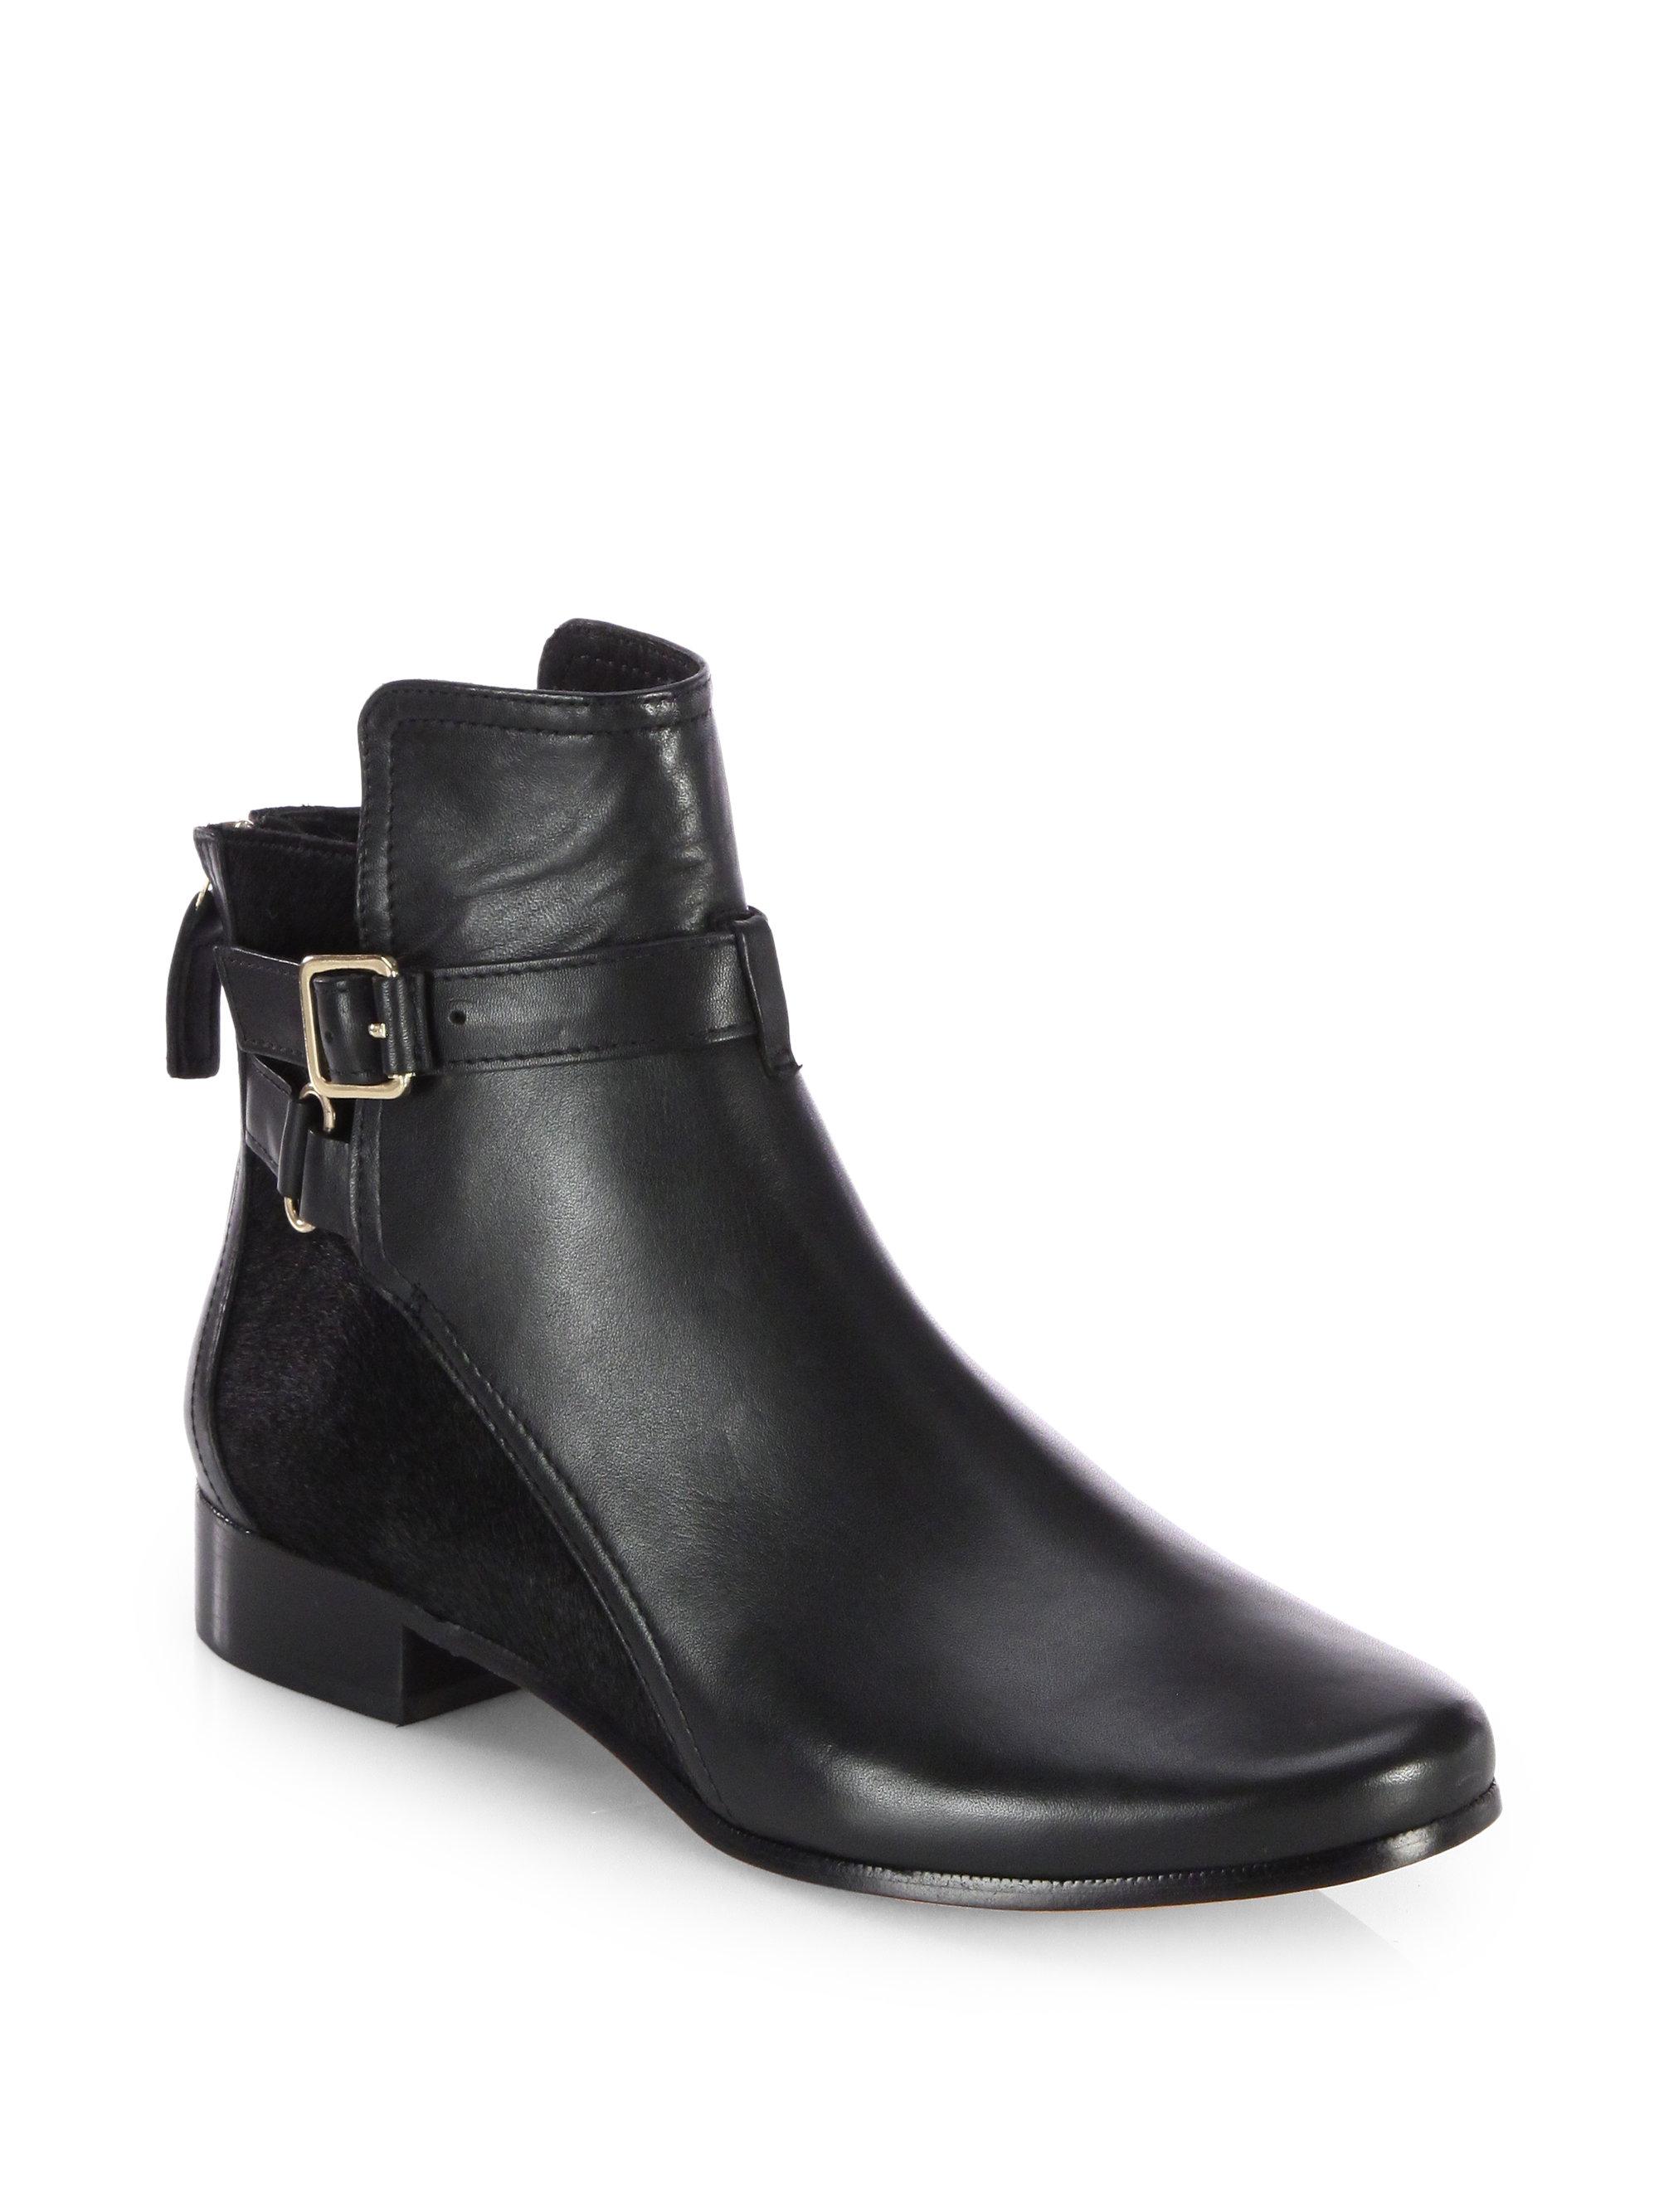 Diane Von Furstenberg Keith Leather Calf Hair Ankle Boots in Black